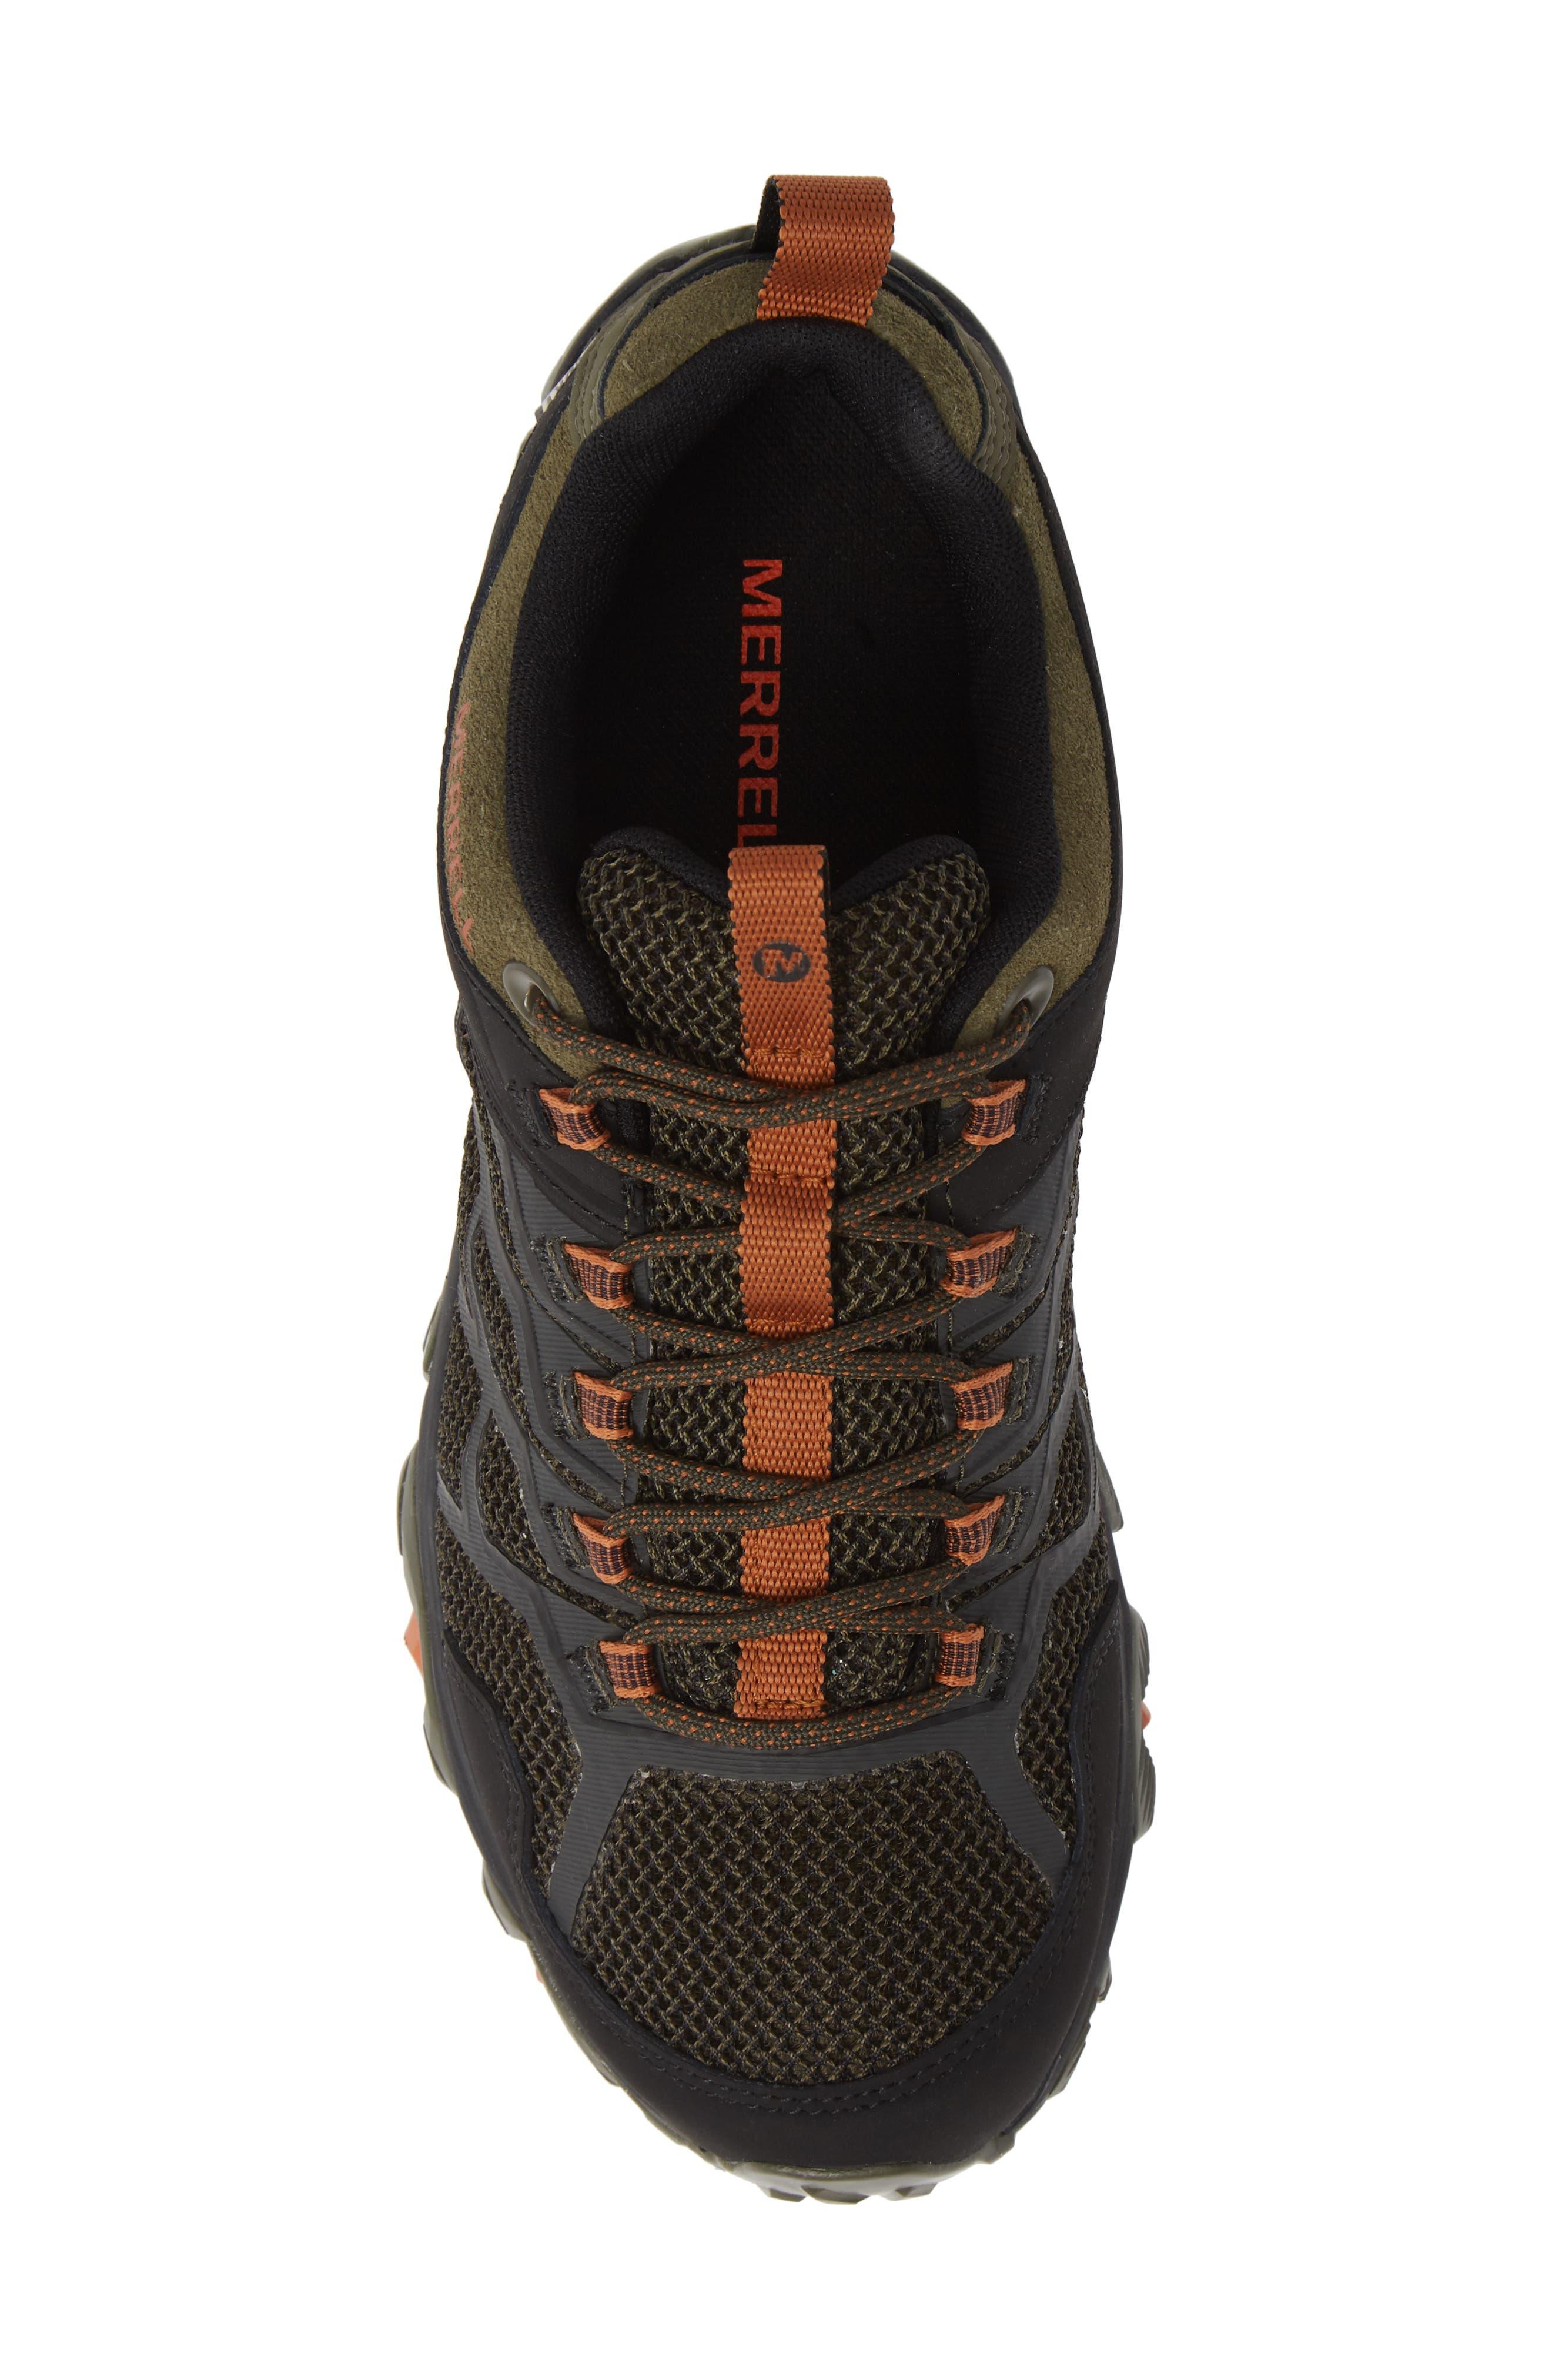 MERRELL, Moab FST 2 Waterproof Hiking Shoe, Alternate thumbnail 5, color, OLIVE/ ADOBE